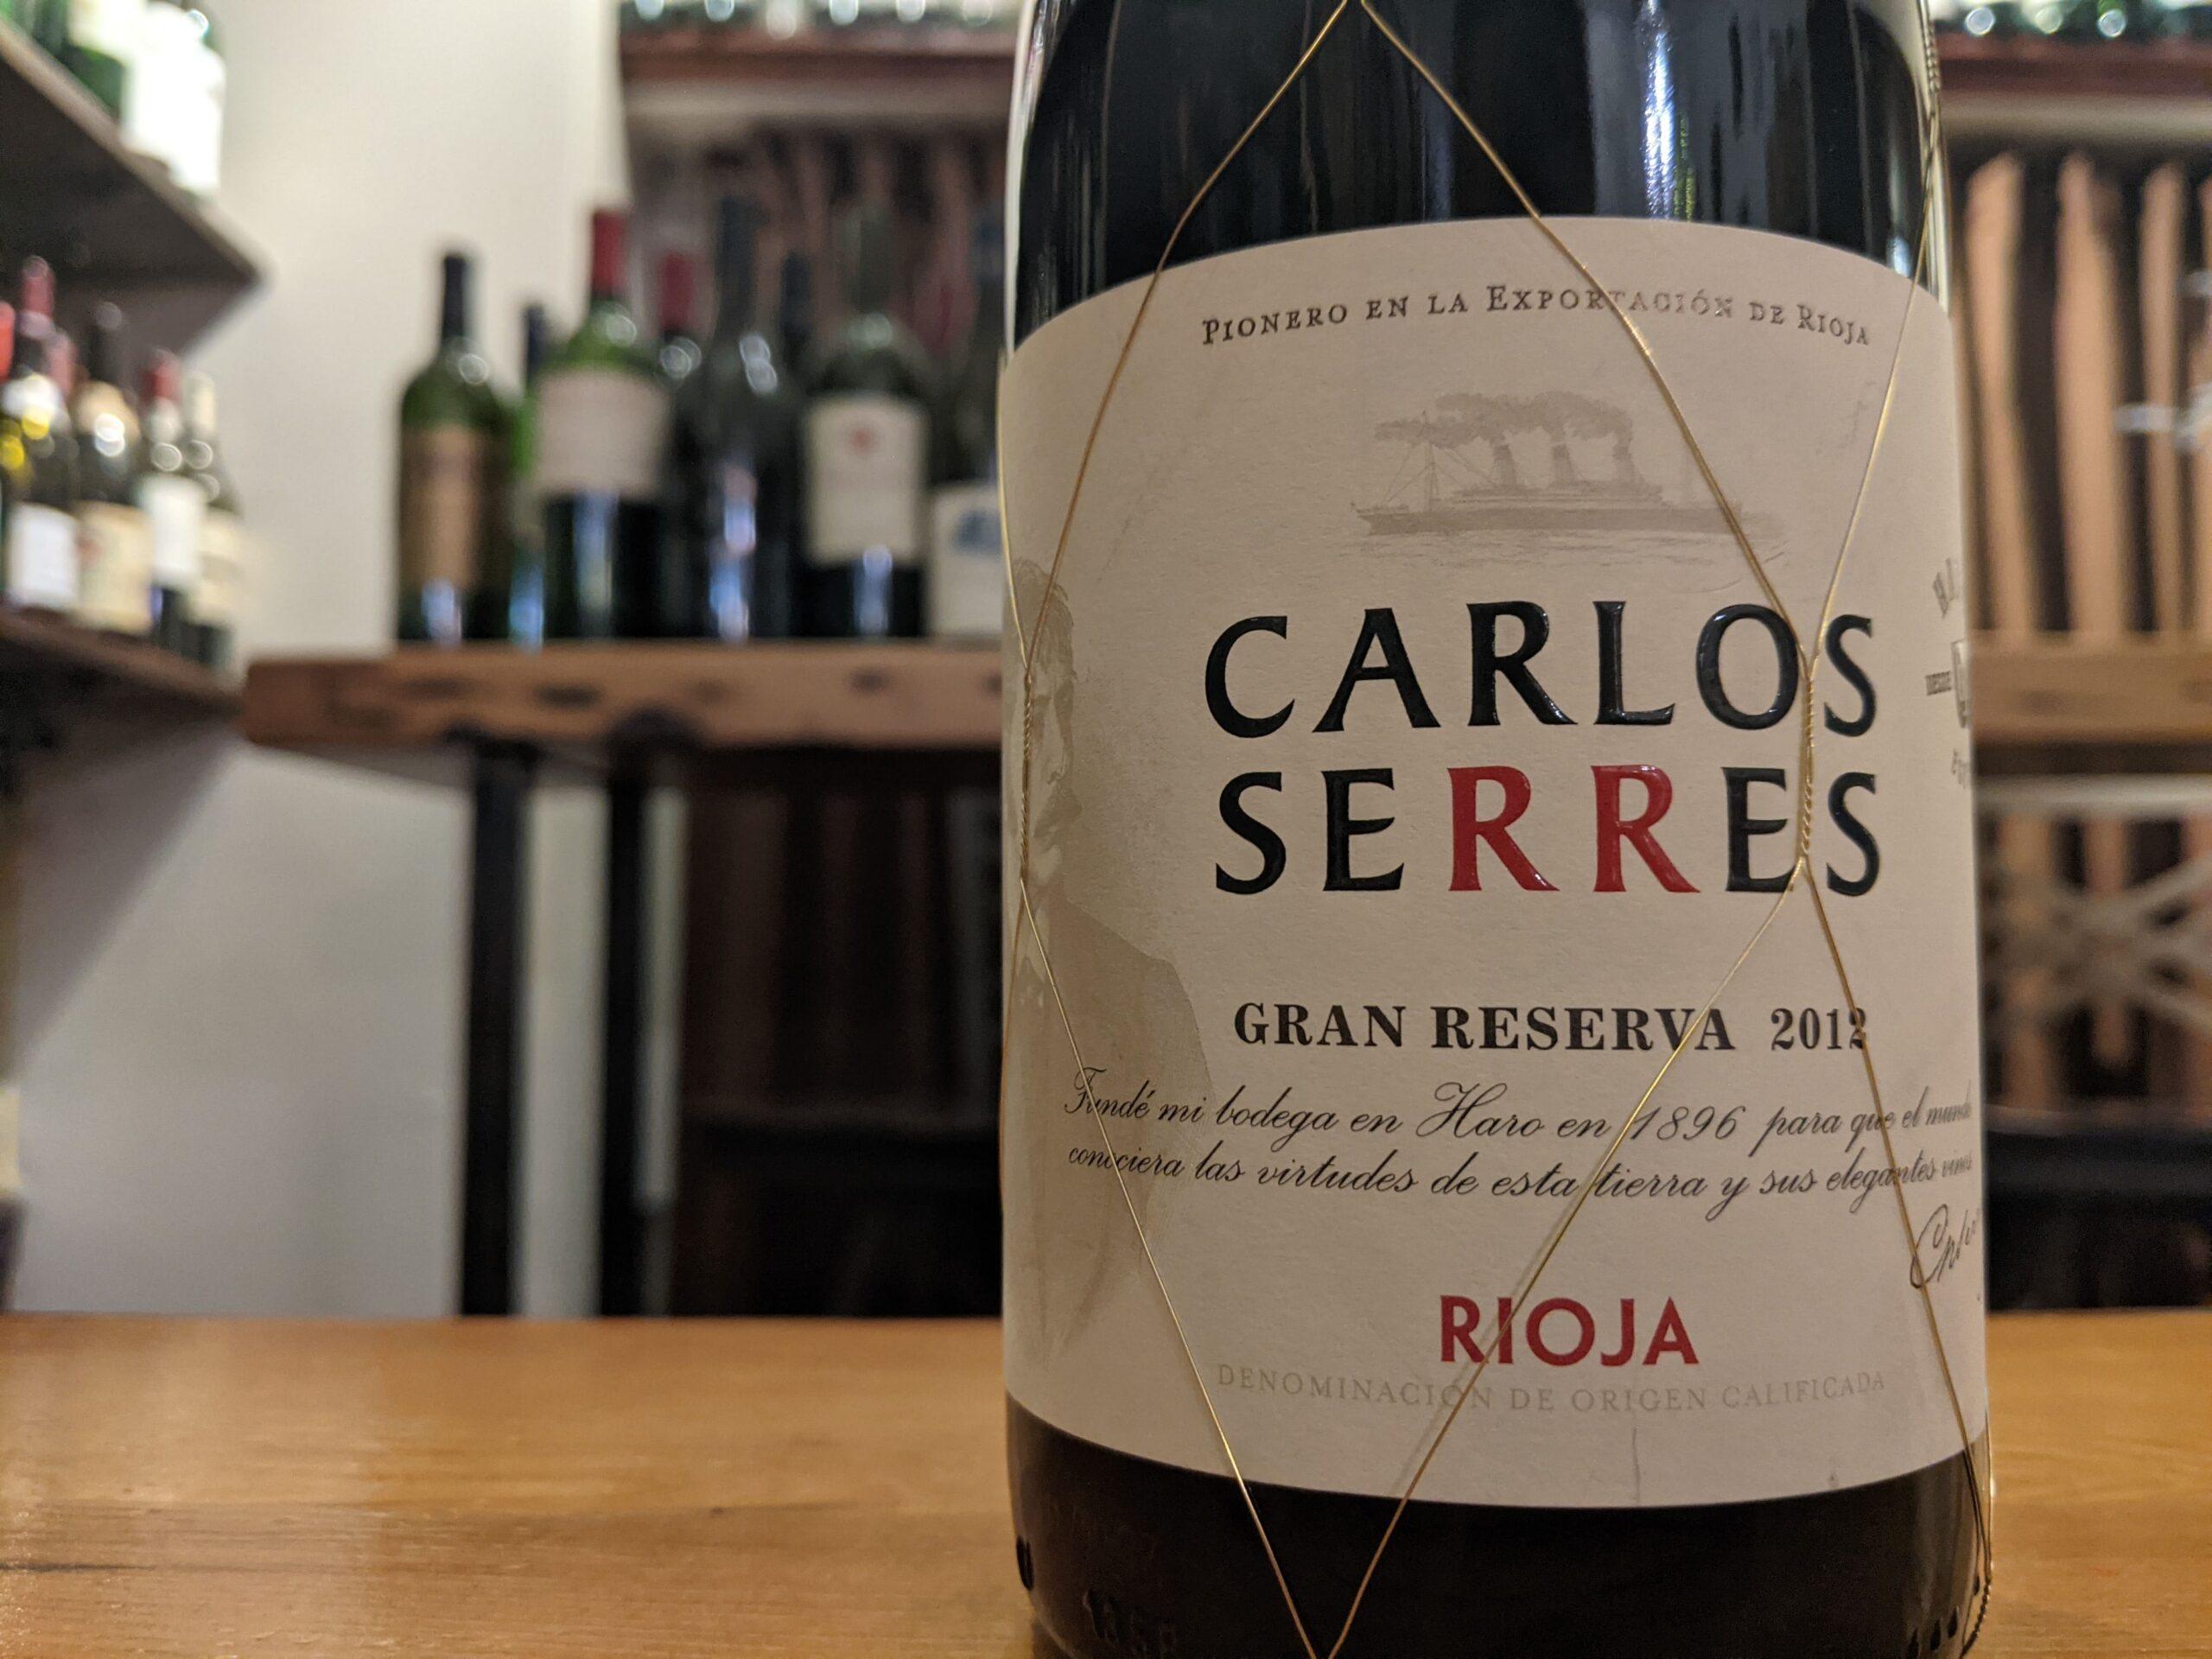 Carlos Serres 2012 Rioja Gran Reserva